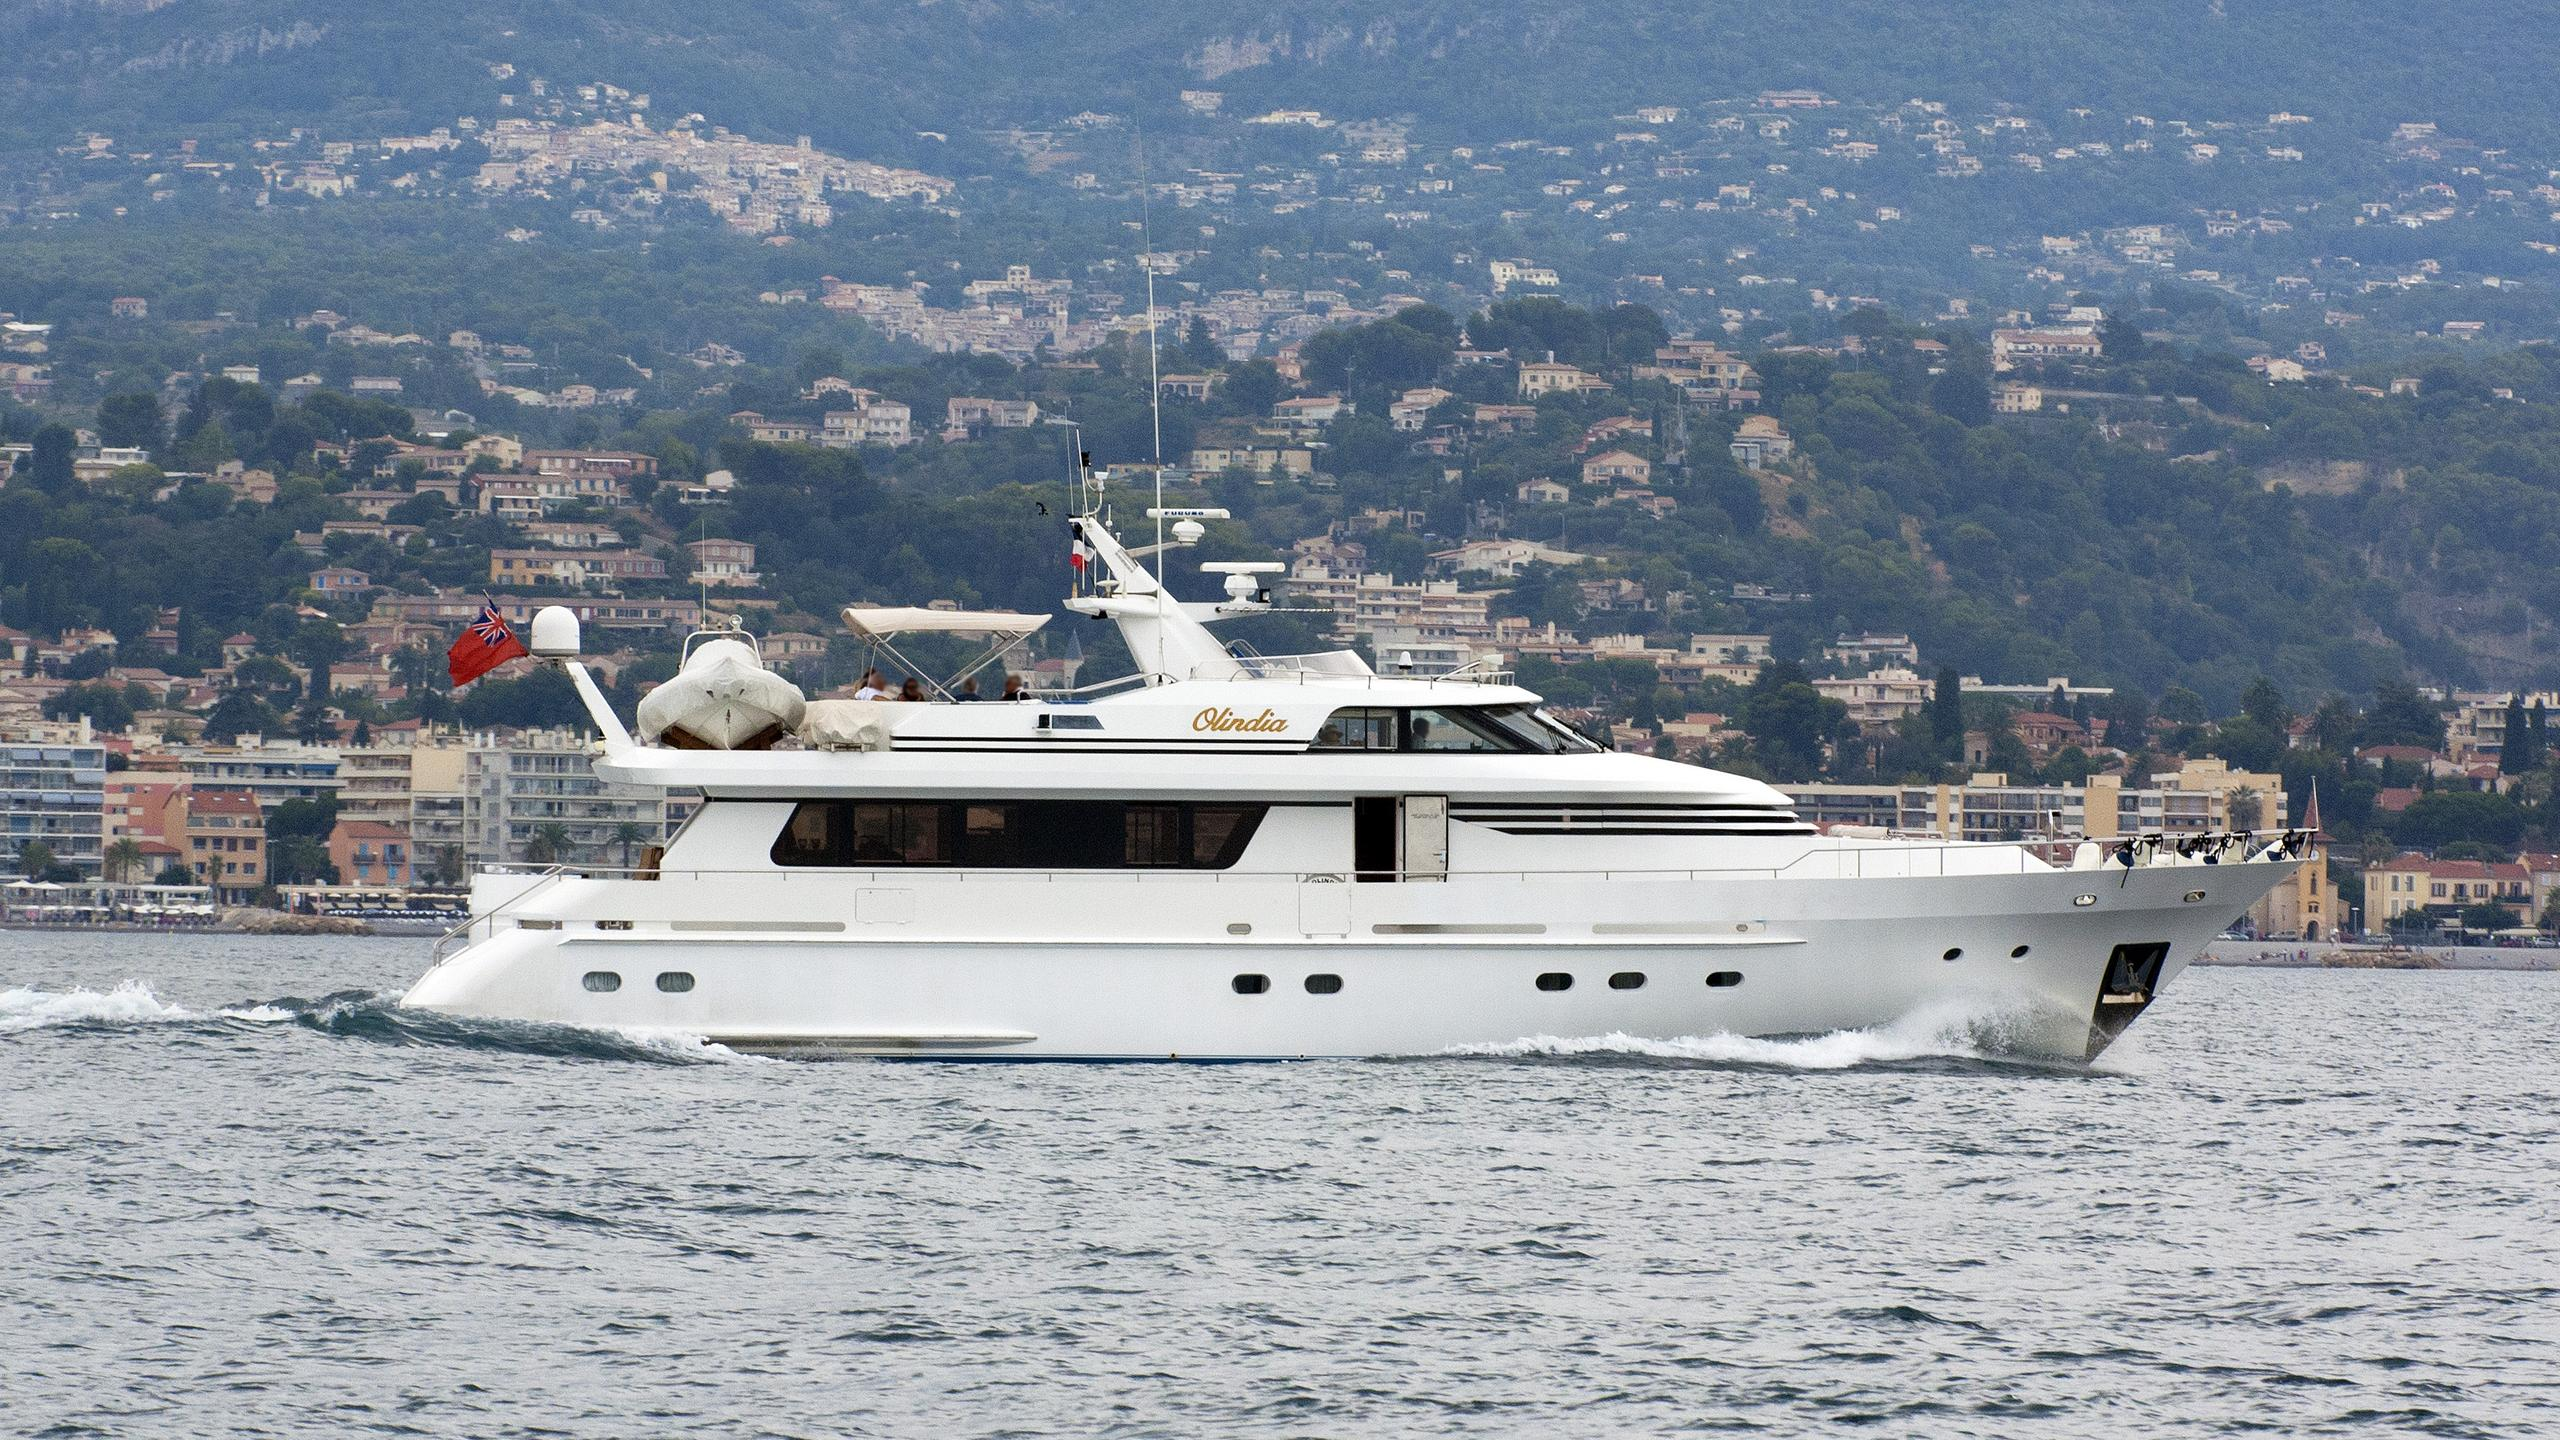 olindia-motor-yacht-lowland-neth-ship-87-1994-26m-cruising